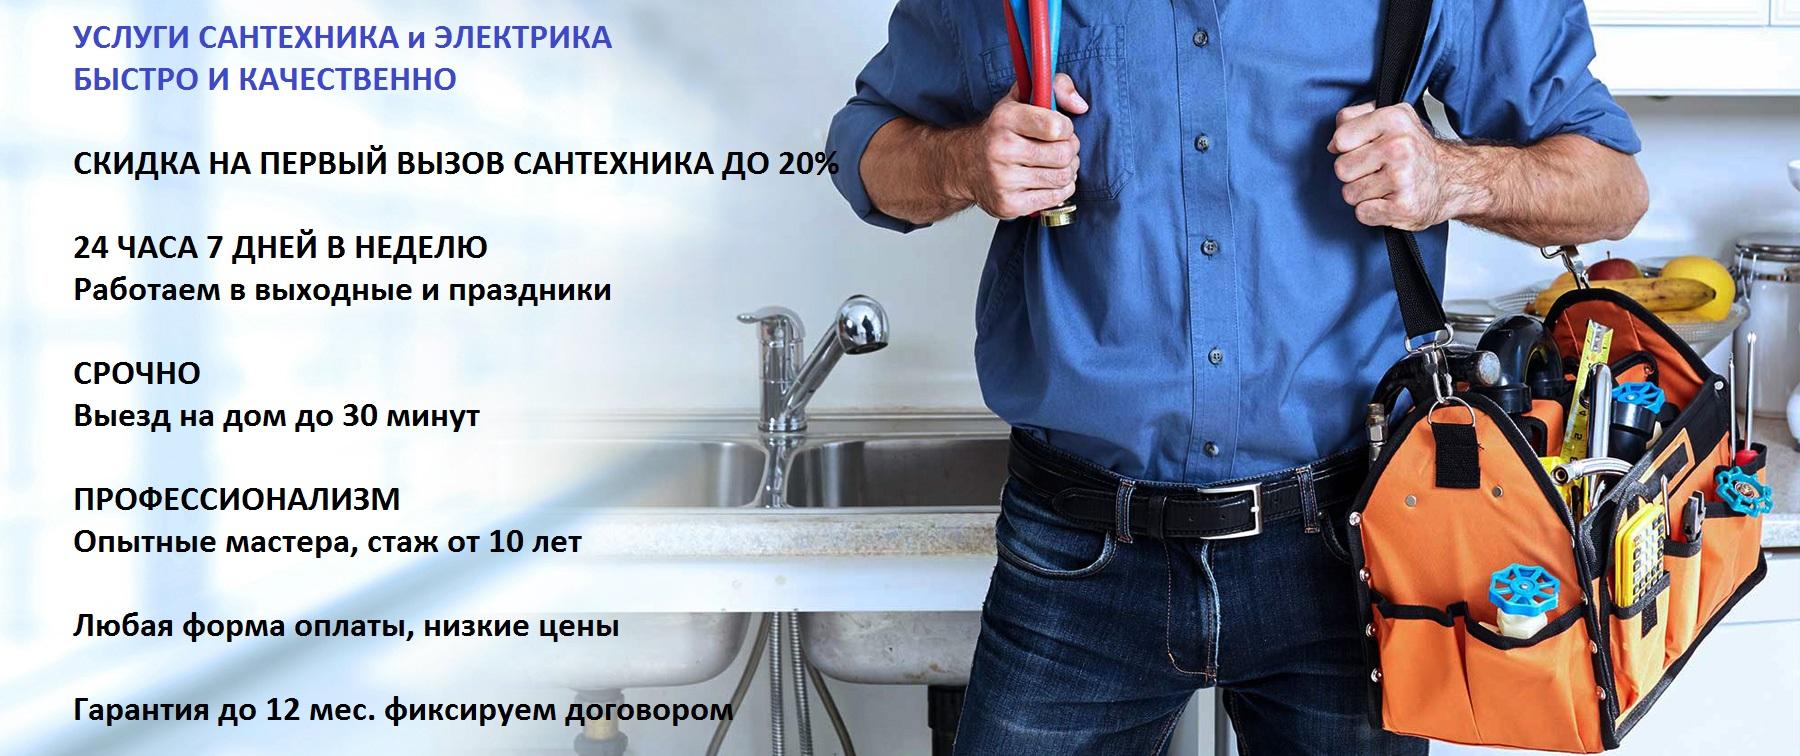 Сантехник Уфа 24 часа